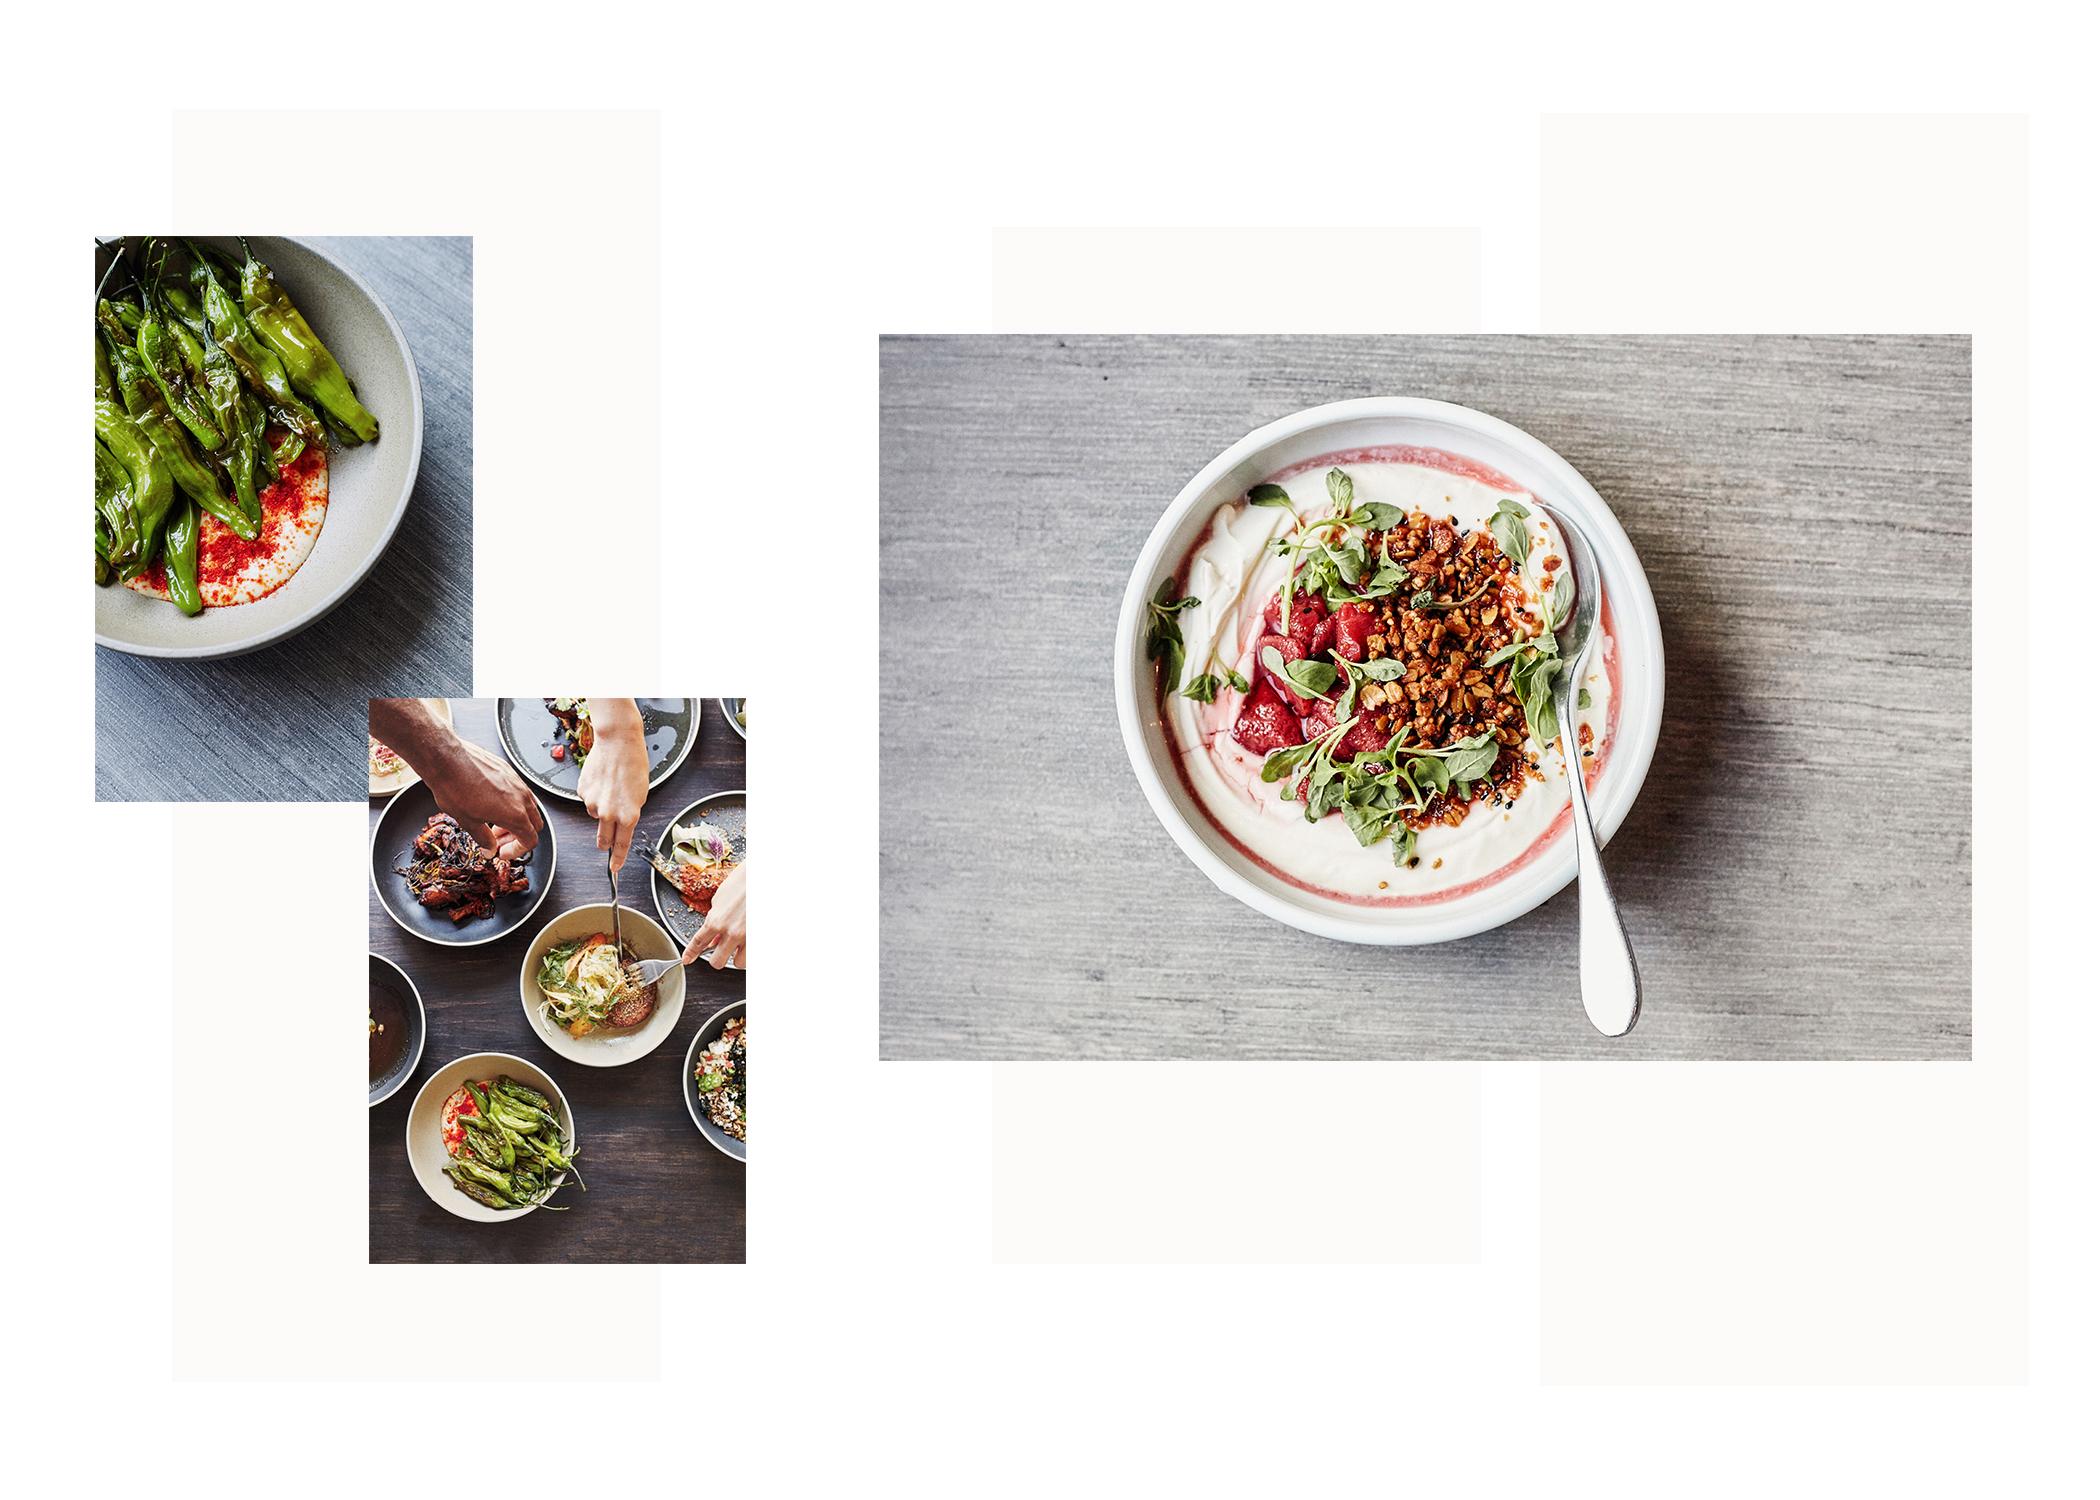 Portfolio_Food_2019_ShelleySom_006.jpg